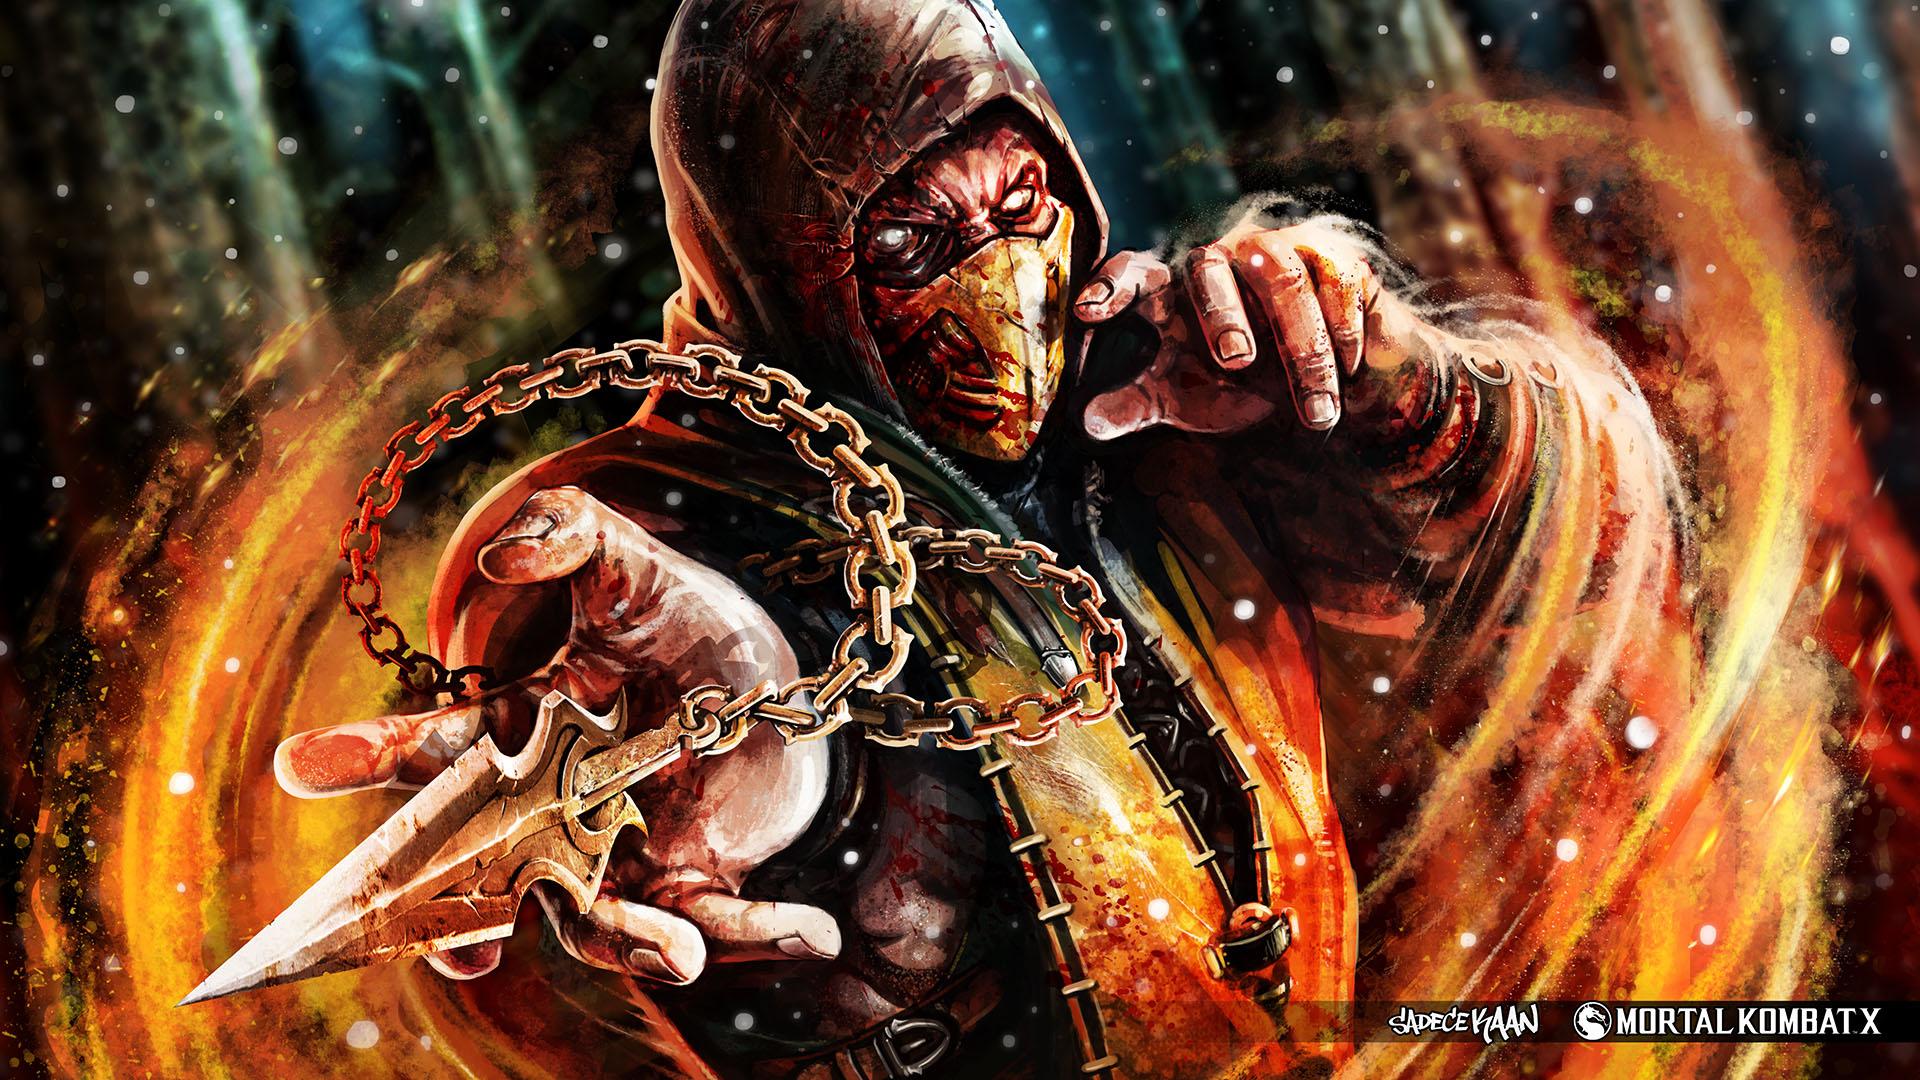 1460161668_134.jpg - Mortal Kombat X